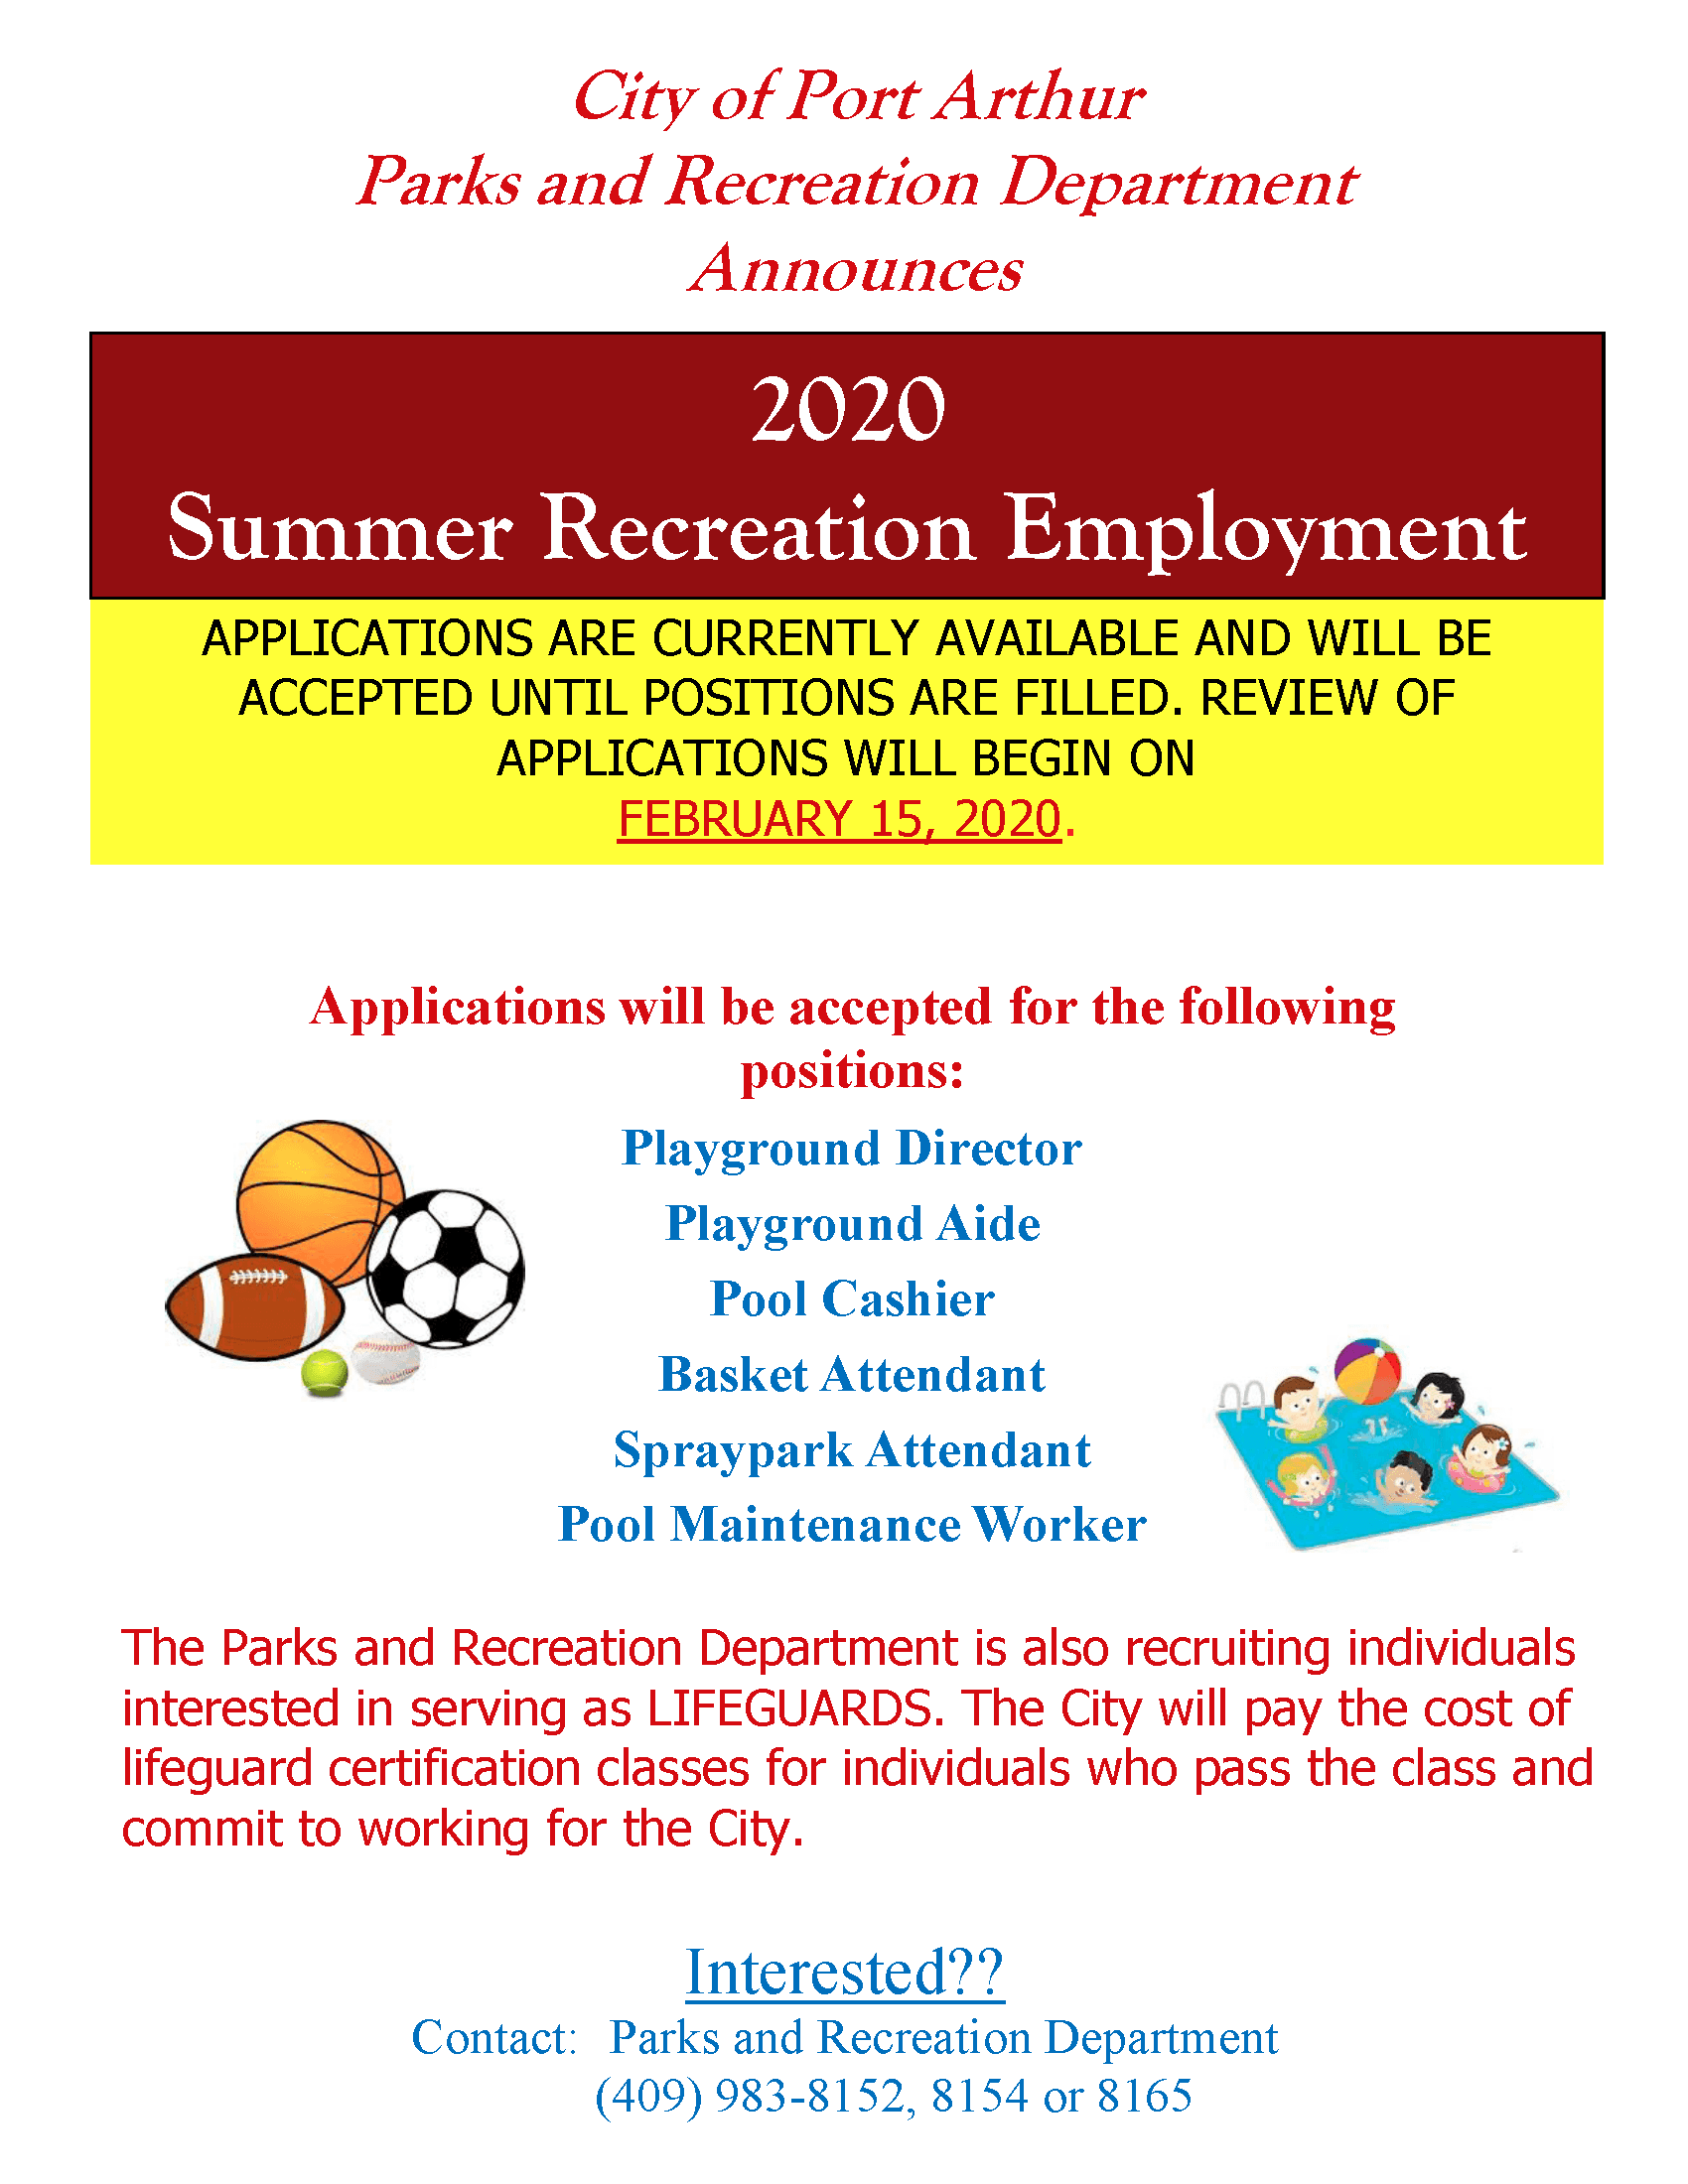 Summer Recreation Employment Flyer-2020